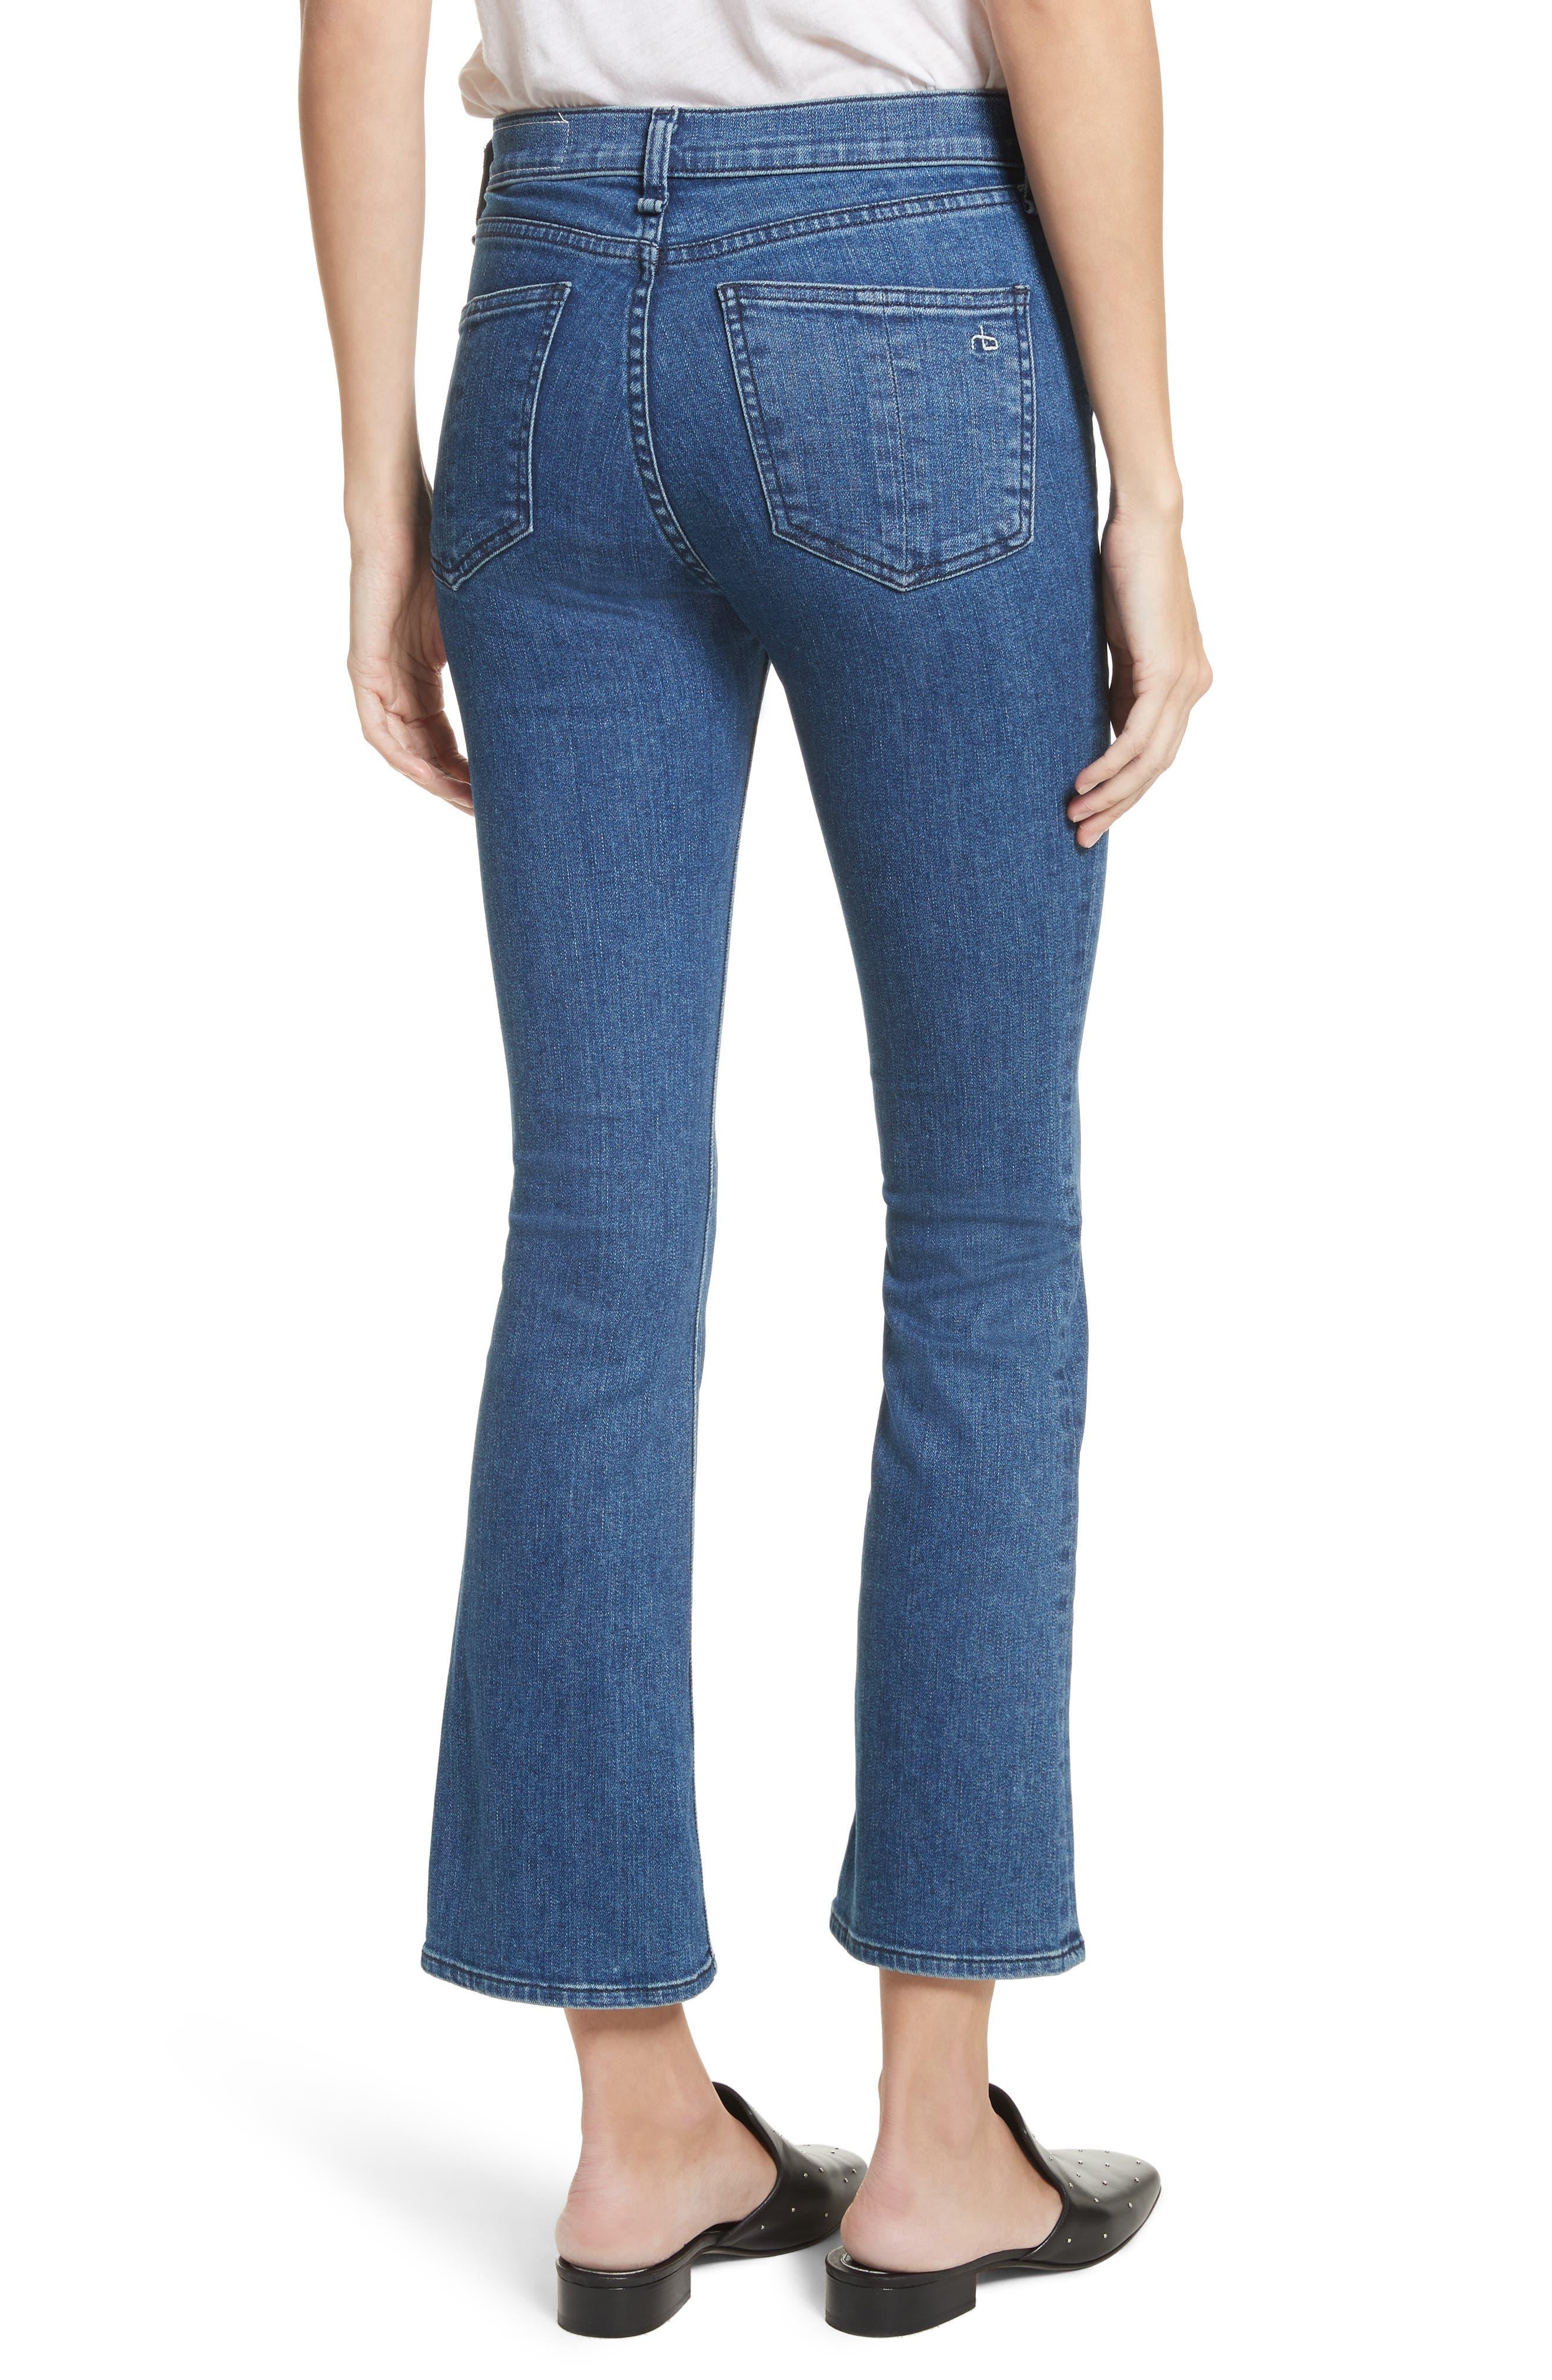 Hana High Waist Crop Bootcut Jeans,                             Alternate thumbnail 2, color,                             420